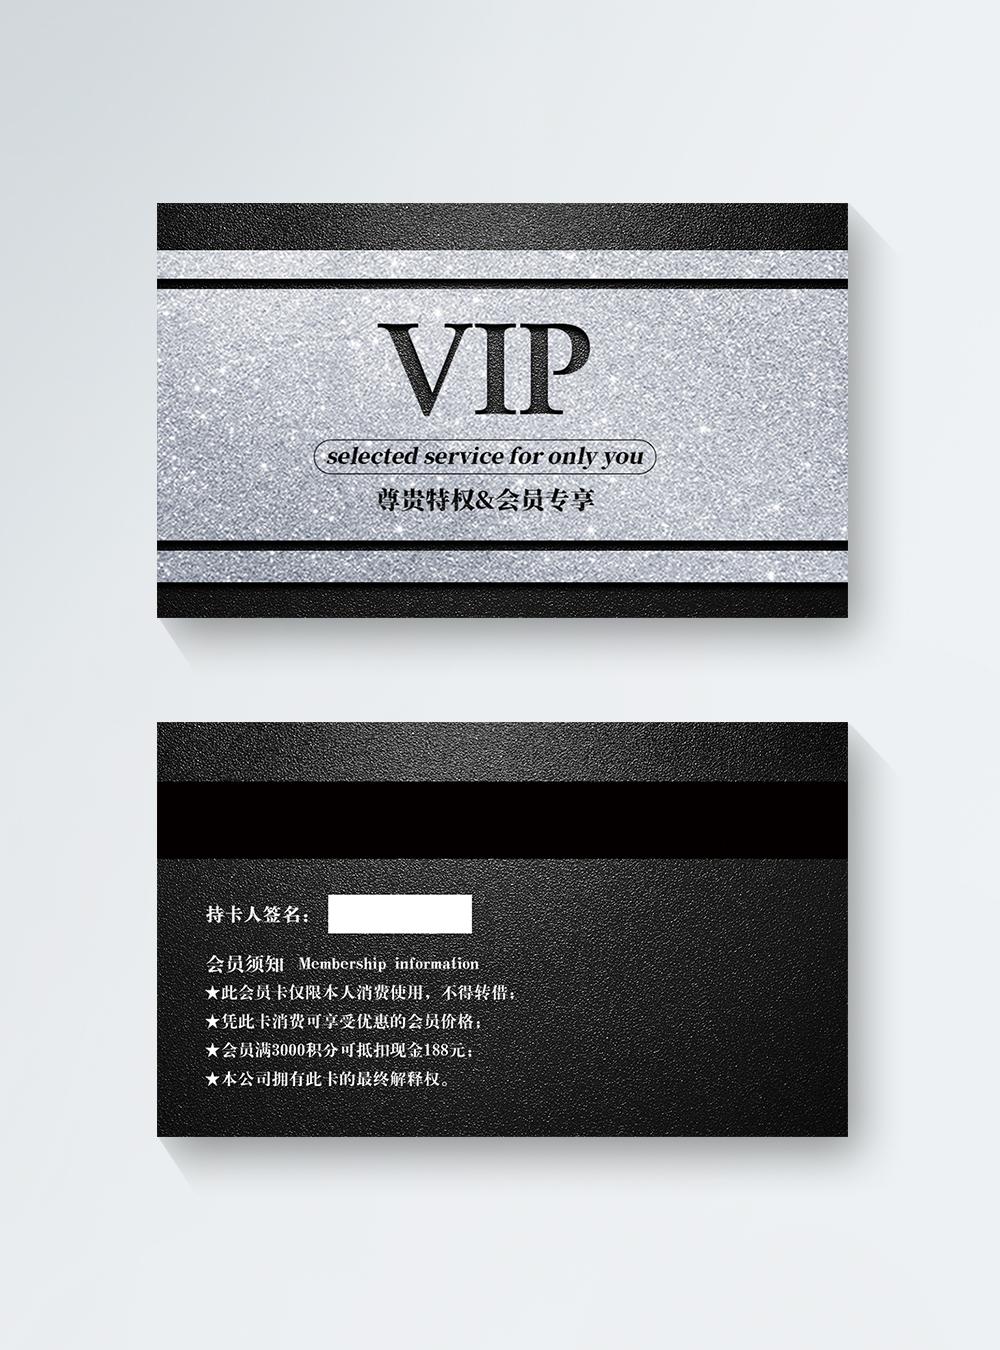 Carte Black Platinum.Photo De Modele De Carte De Membre Black Platinum Vip Numero